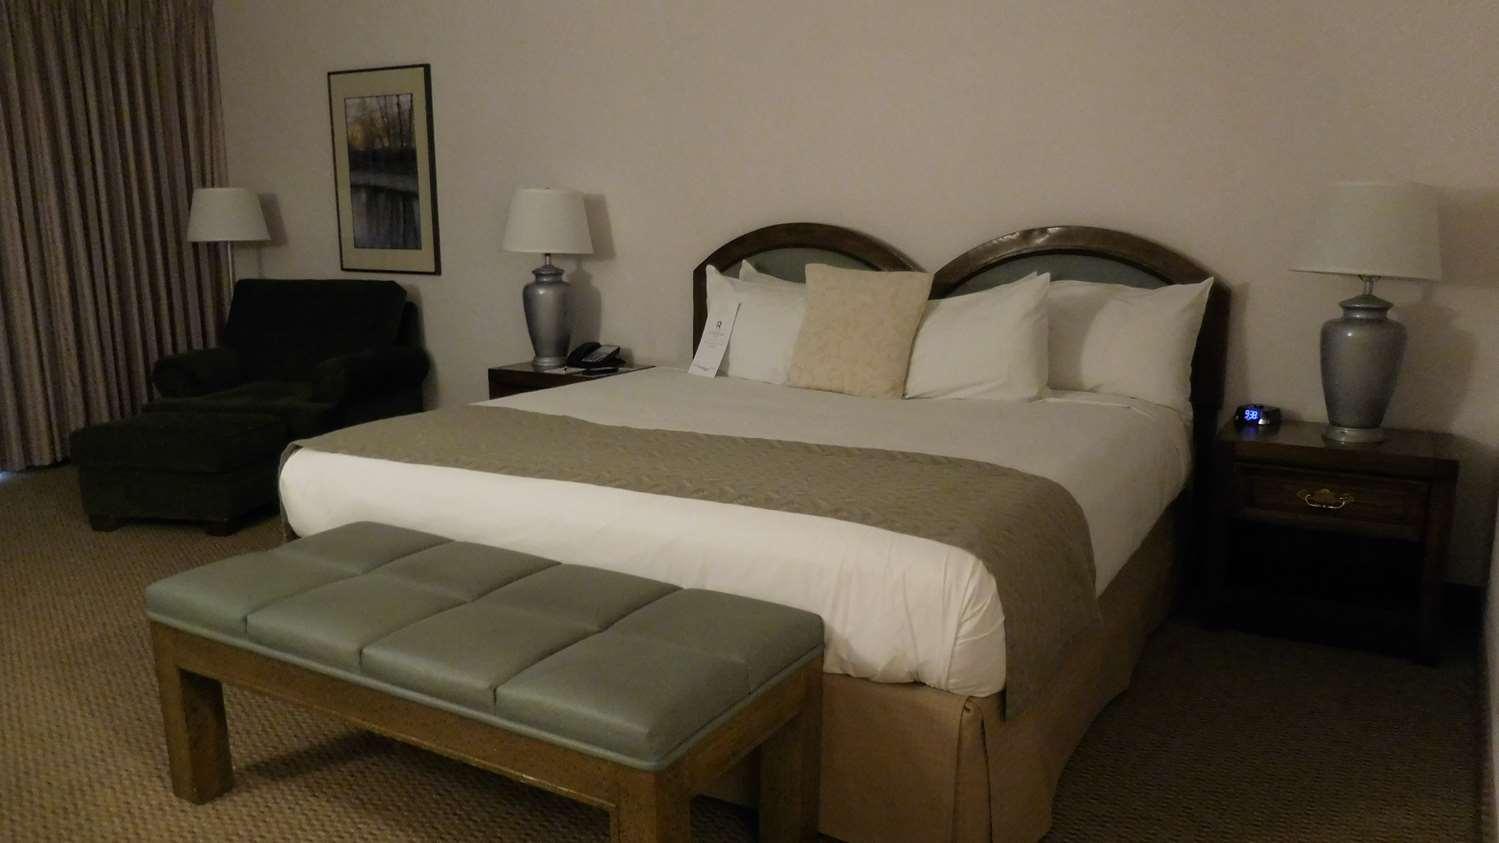 Riverside Hotel Boise Id See Discounts